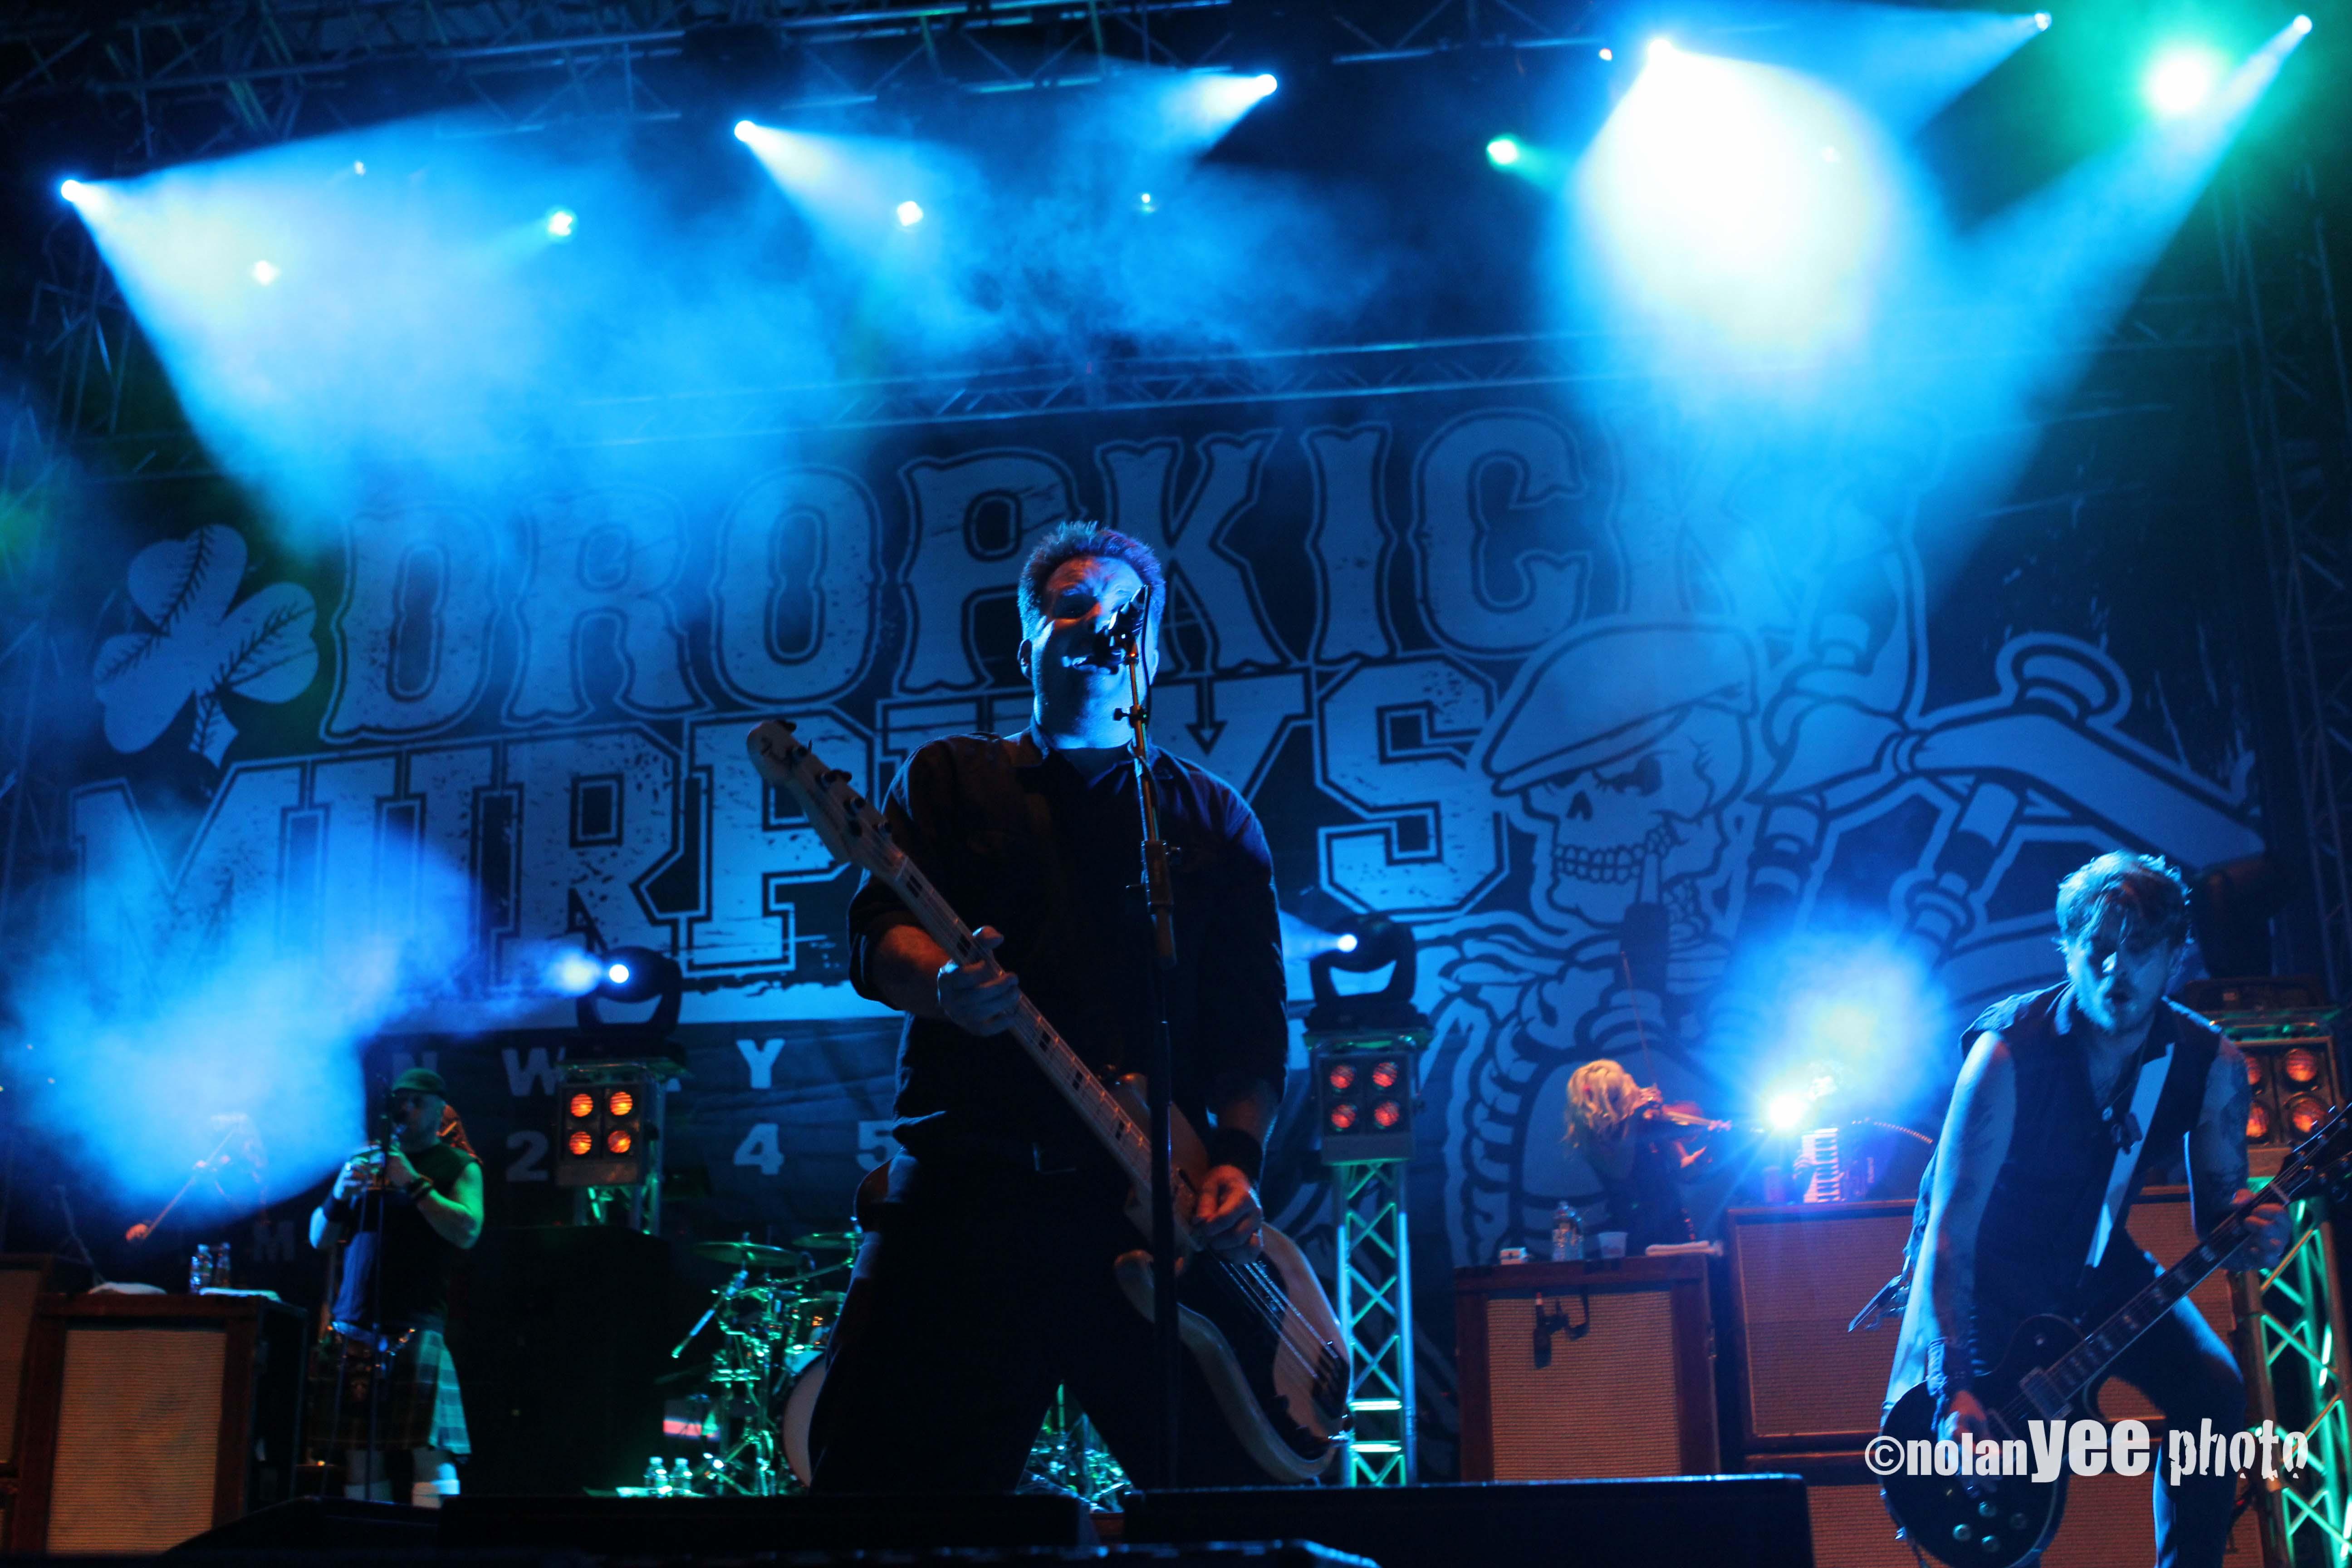 Dropkick Murphys - Fenway Park 2011